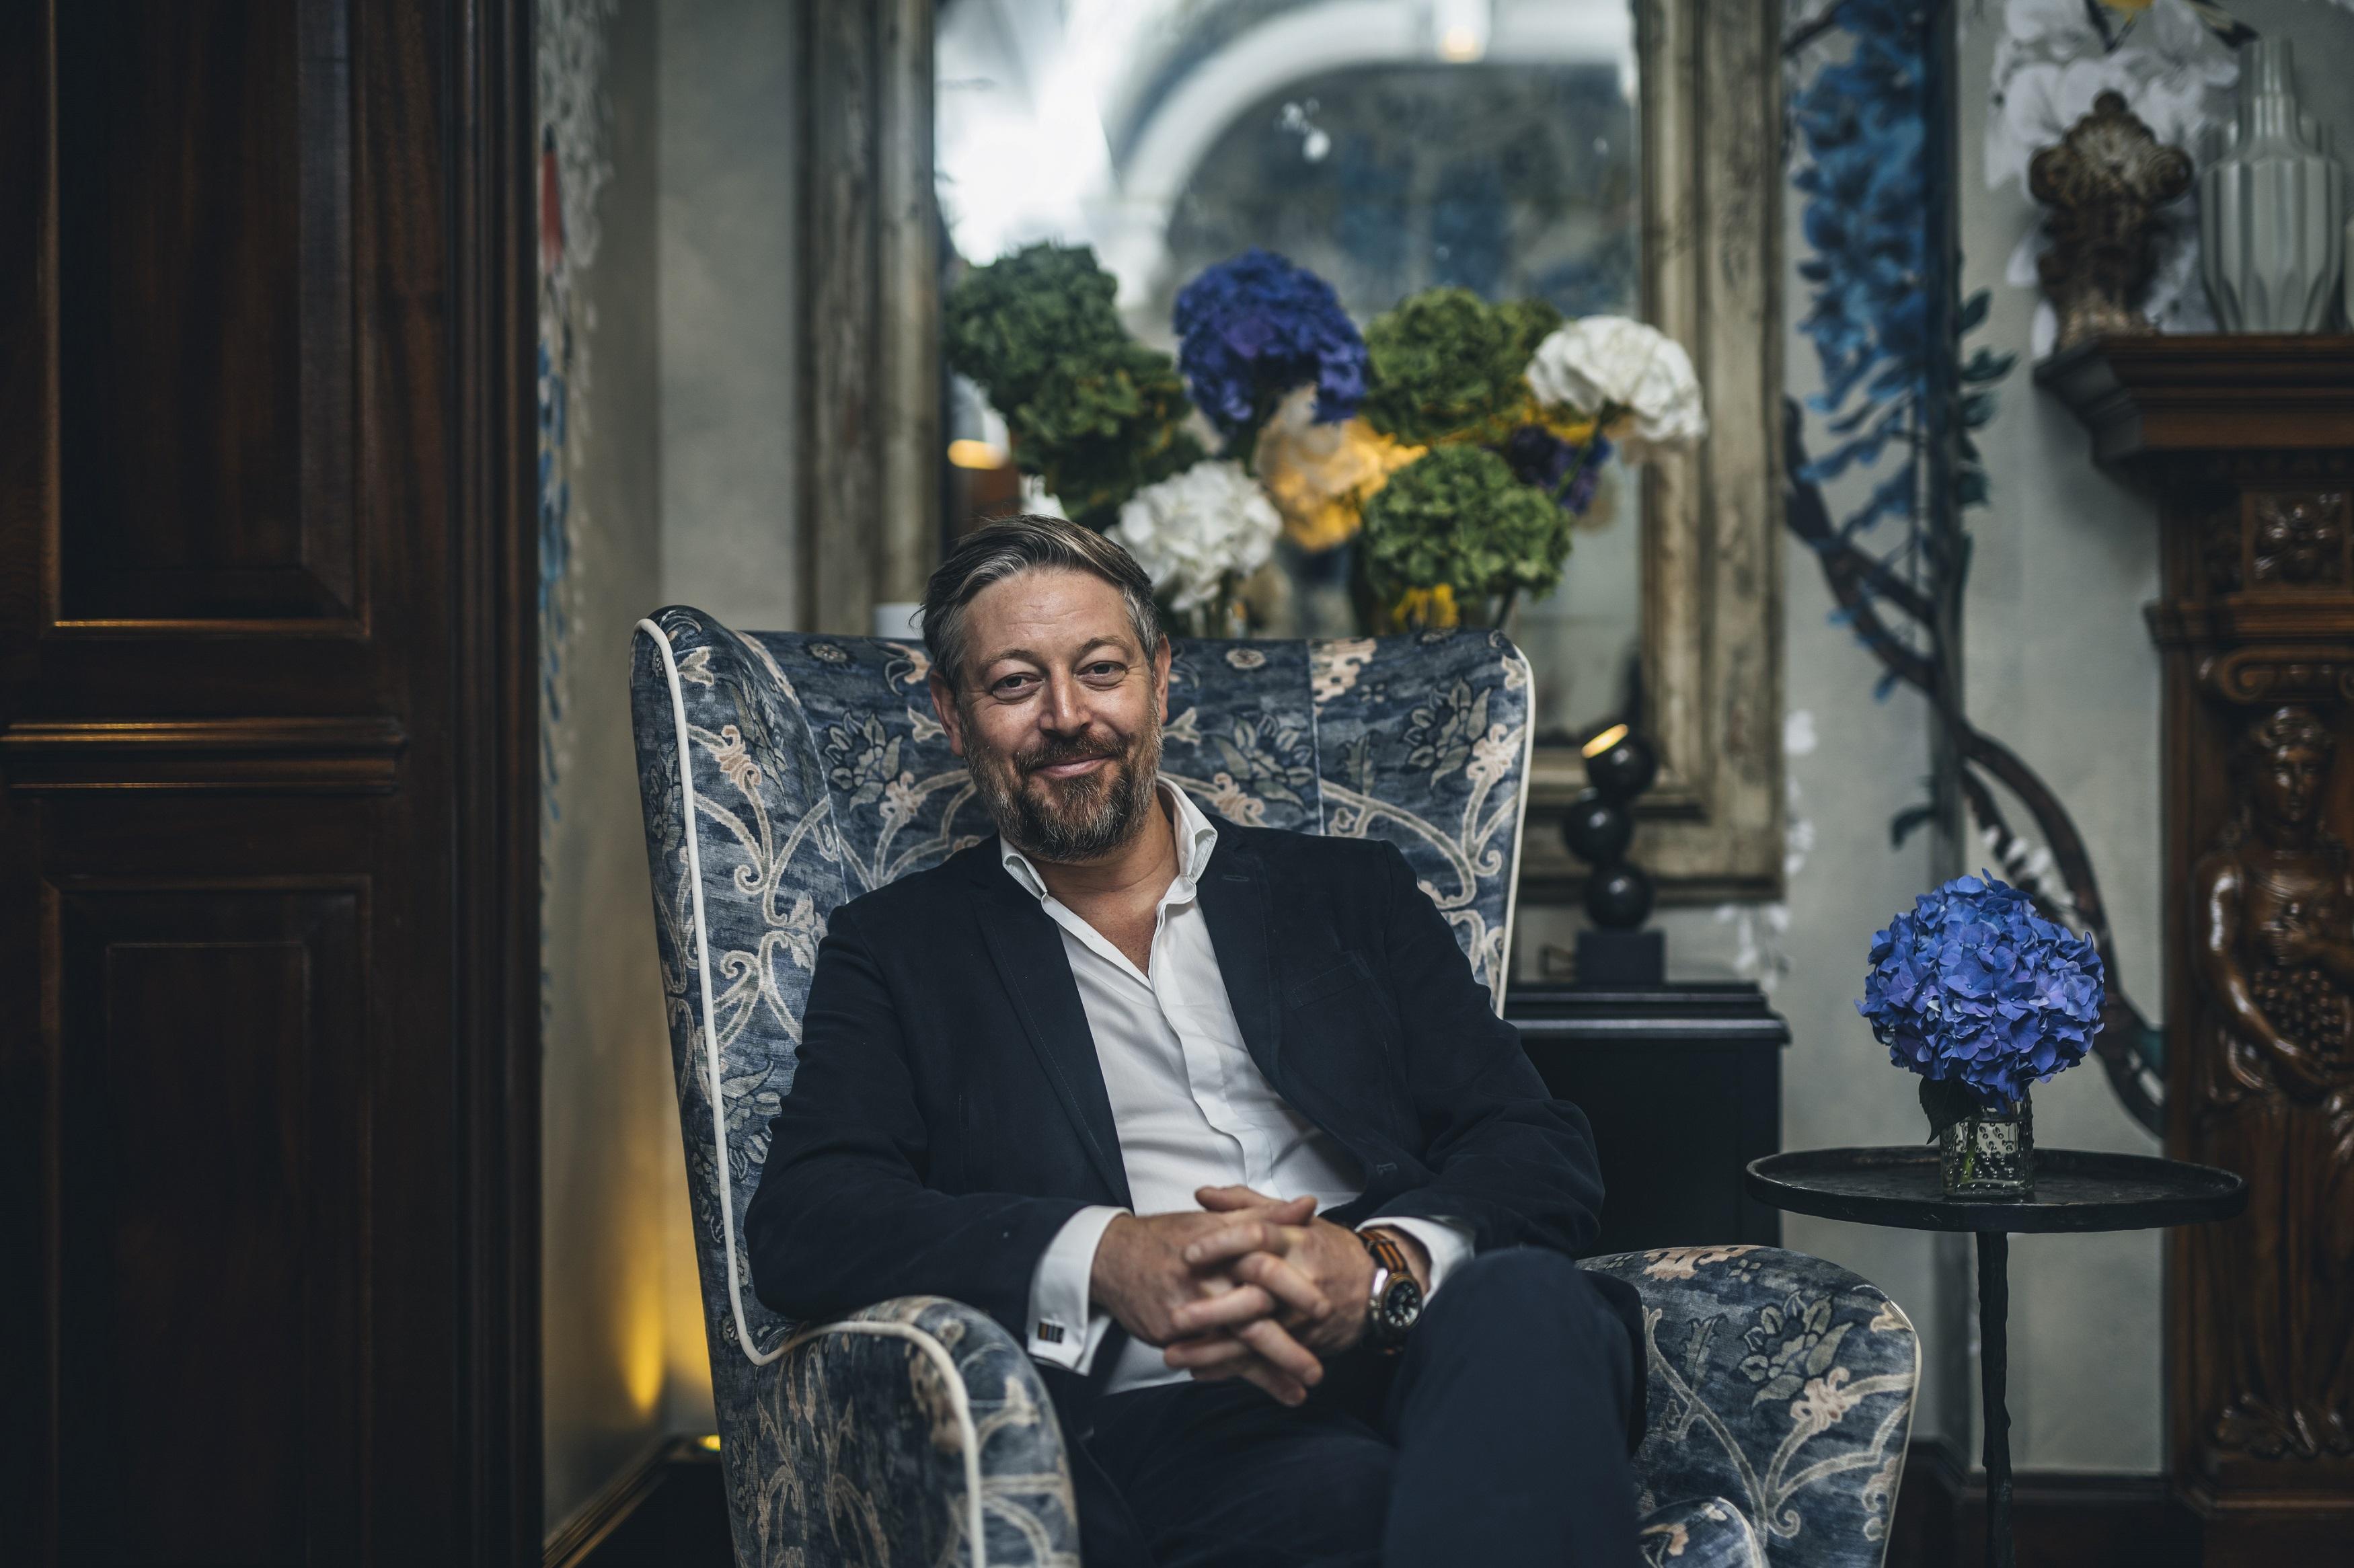 Beck Restaurant at Browns Hotel in Mayfair will be taken over by Michelin-starred Trinity's Adam Byatt